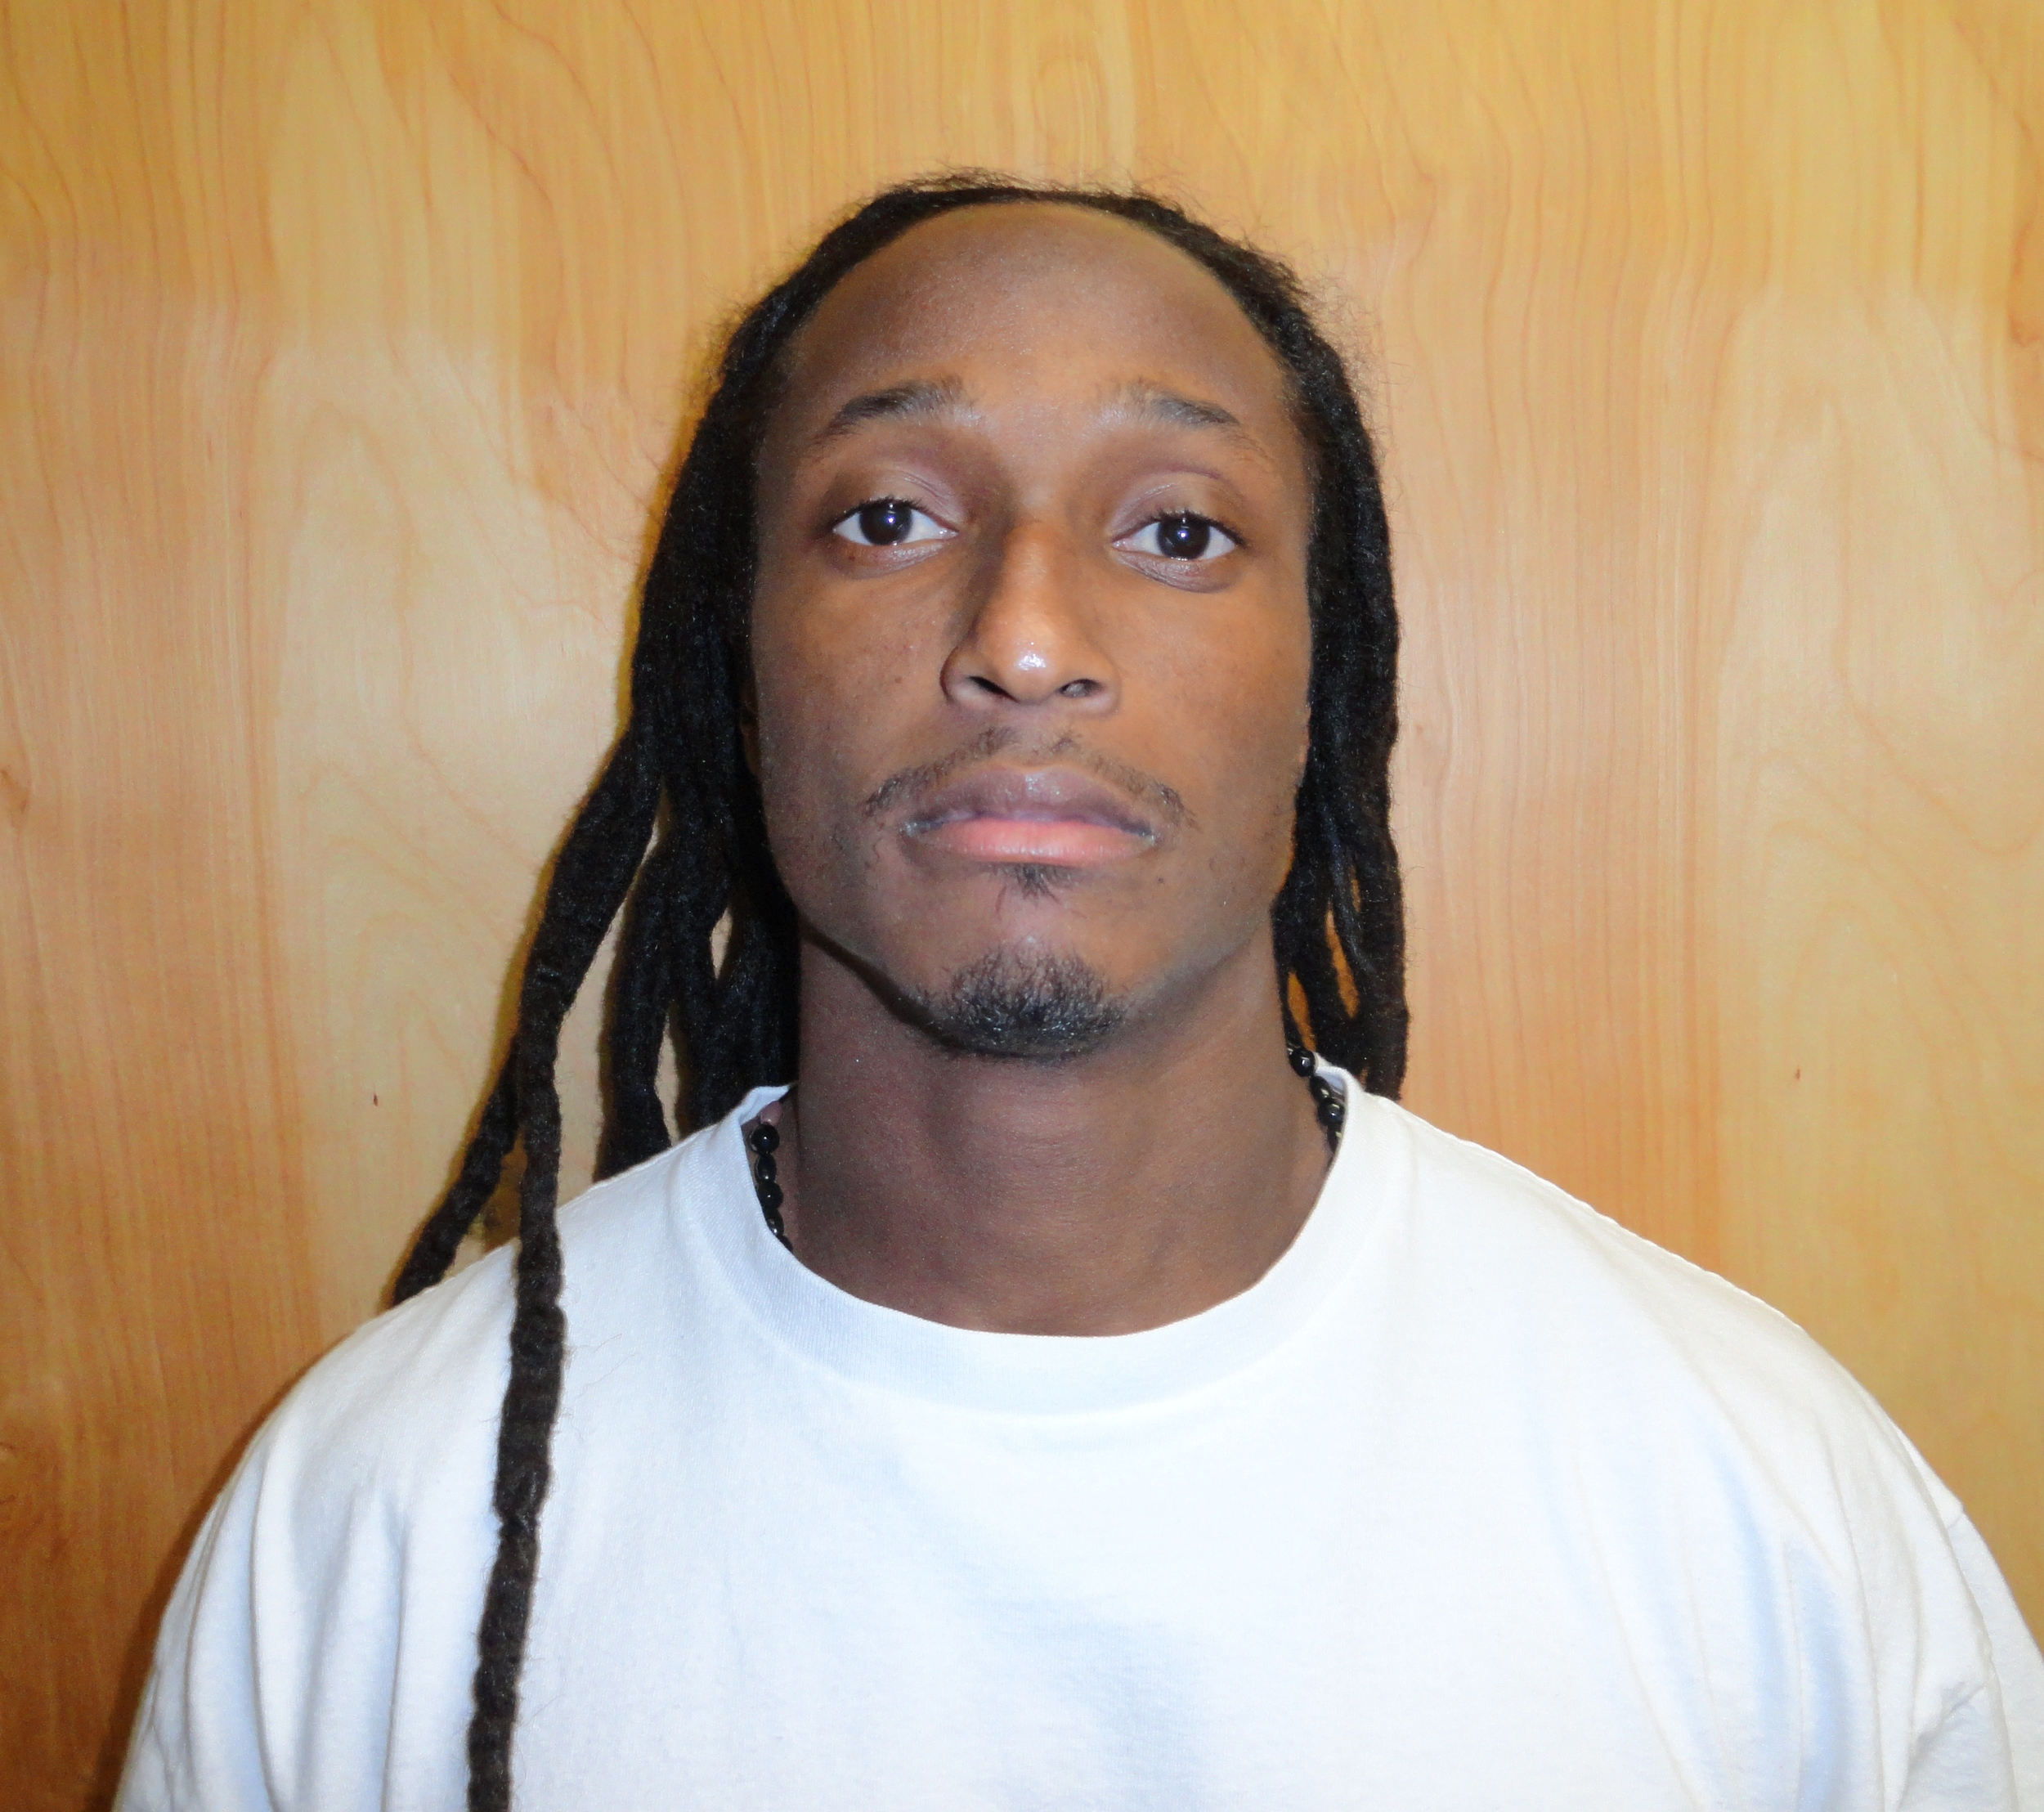 Exsavior Antwan Phillips / 2014 Okla. Sex & Violent Offender Registry